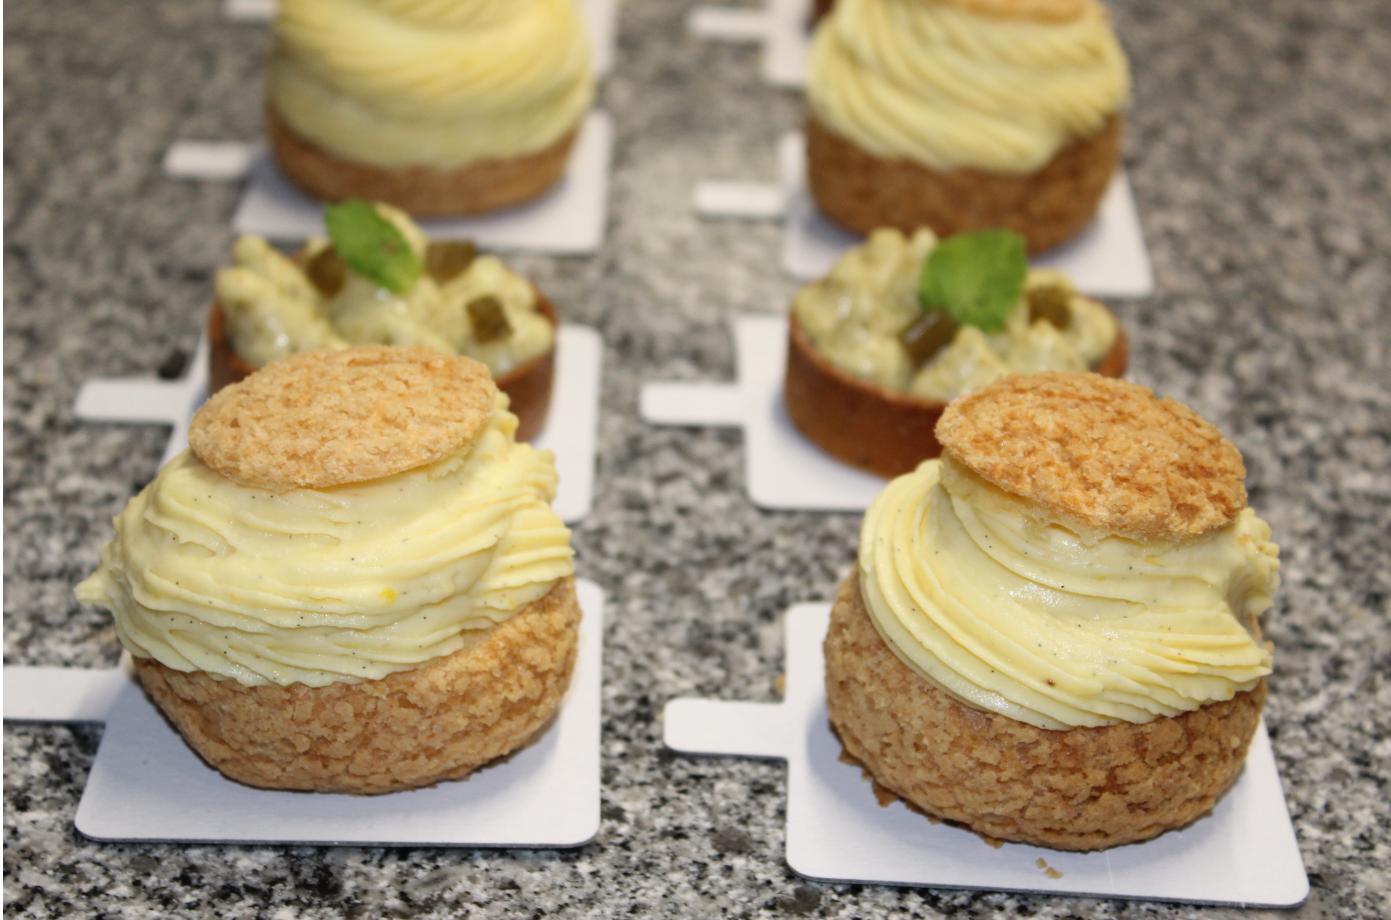 Au menu : gâteau au mojito et choux pralinés coco-ananas.